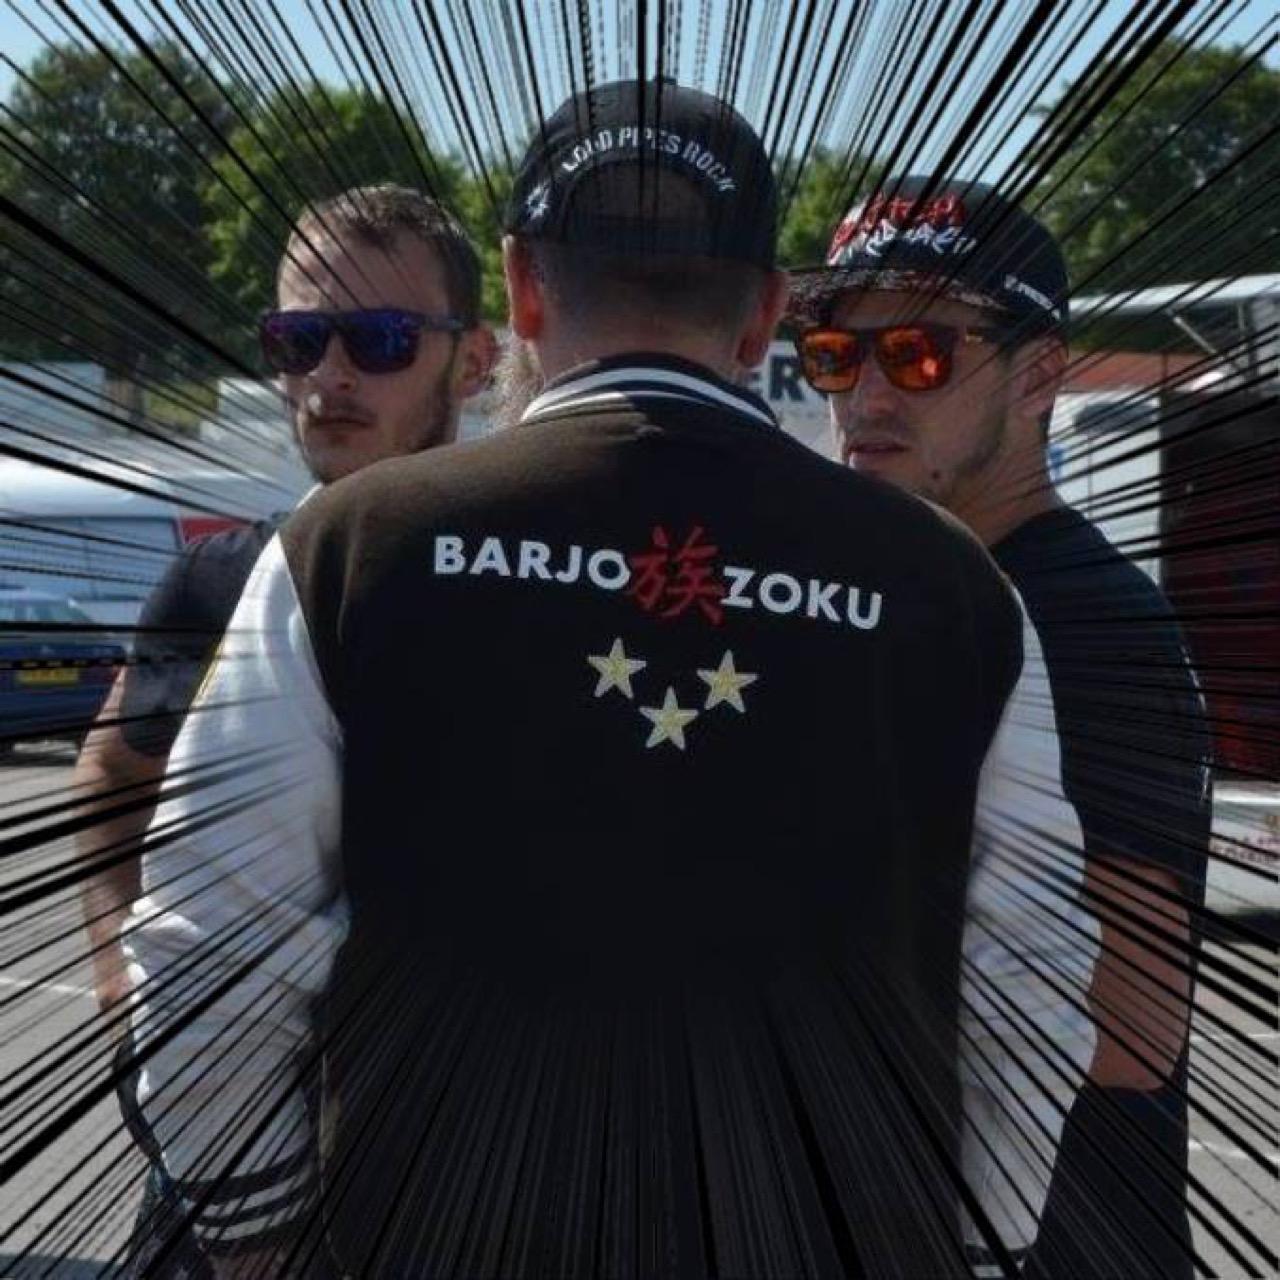 #Petrolhead : Ibra des Barjozoku... Vraiment barj' ?! 3